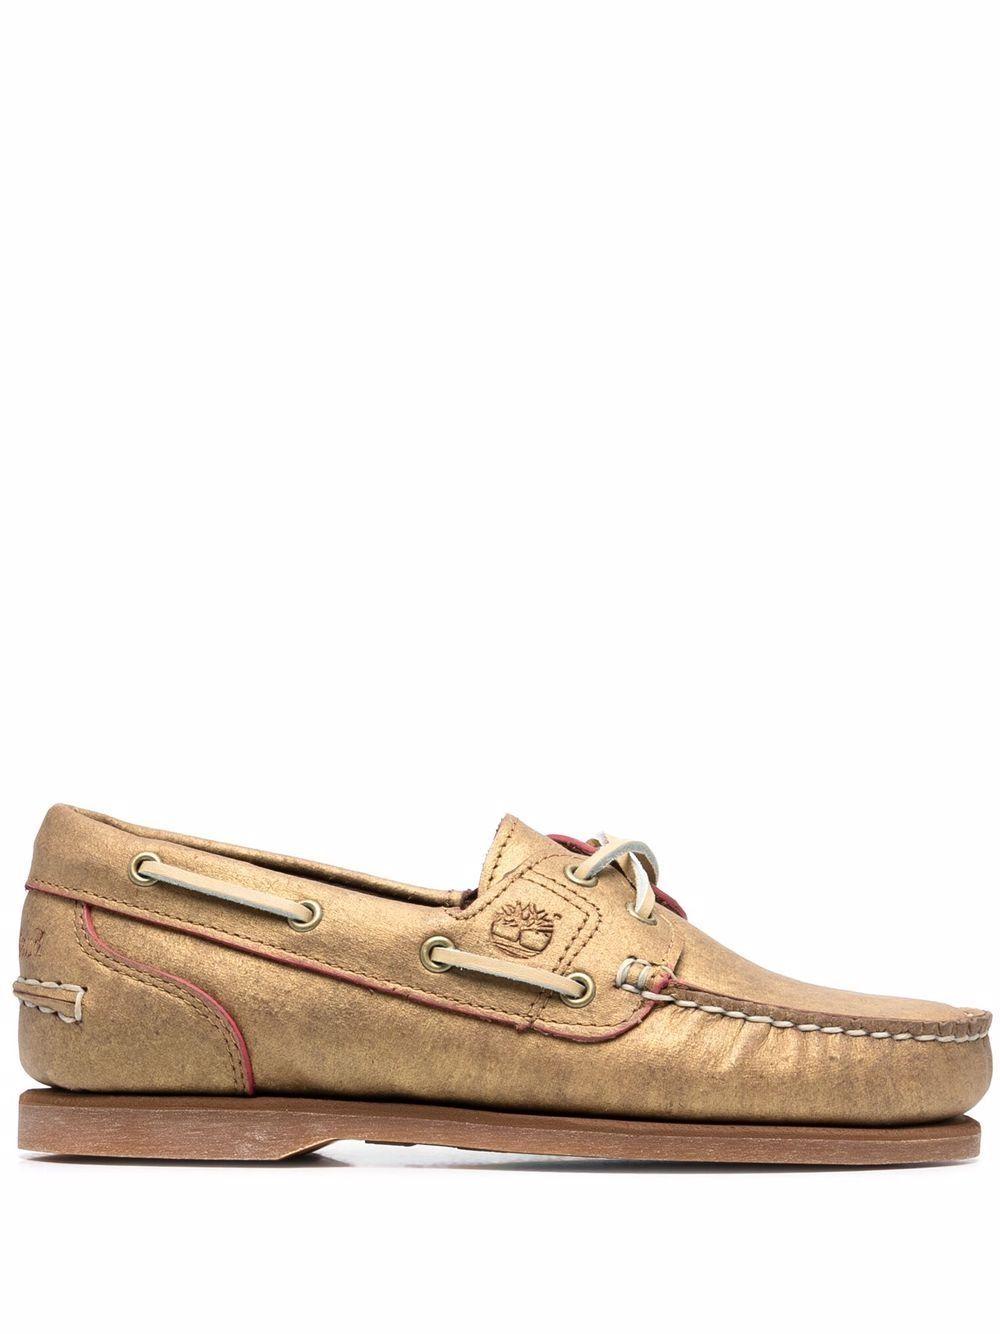 Timberland scarpe basse oro